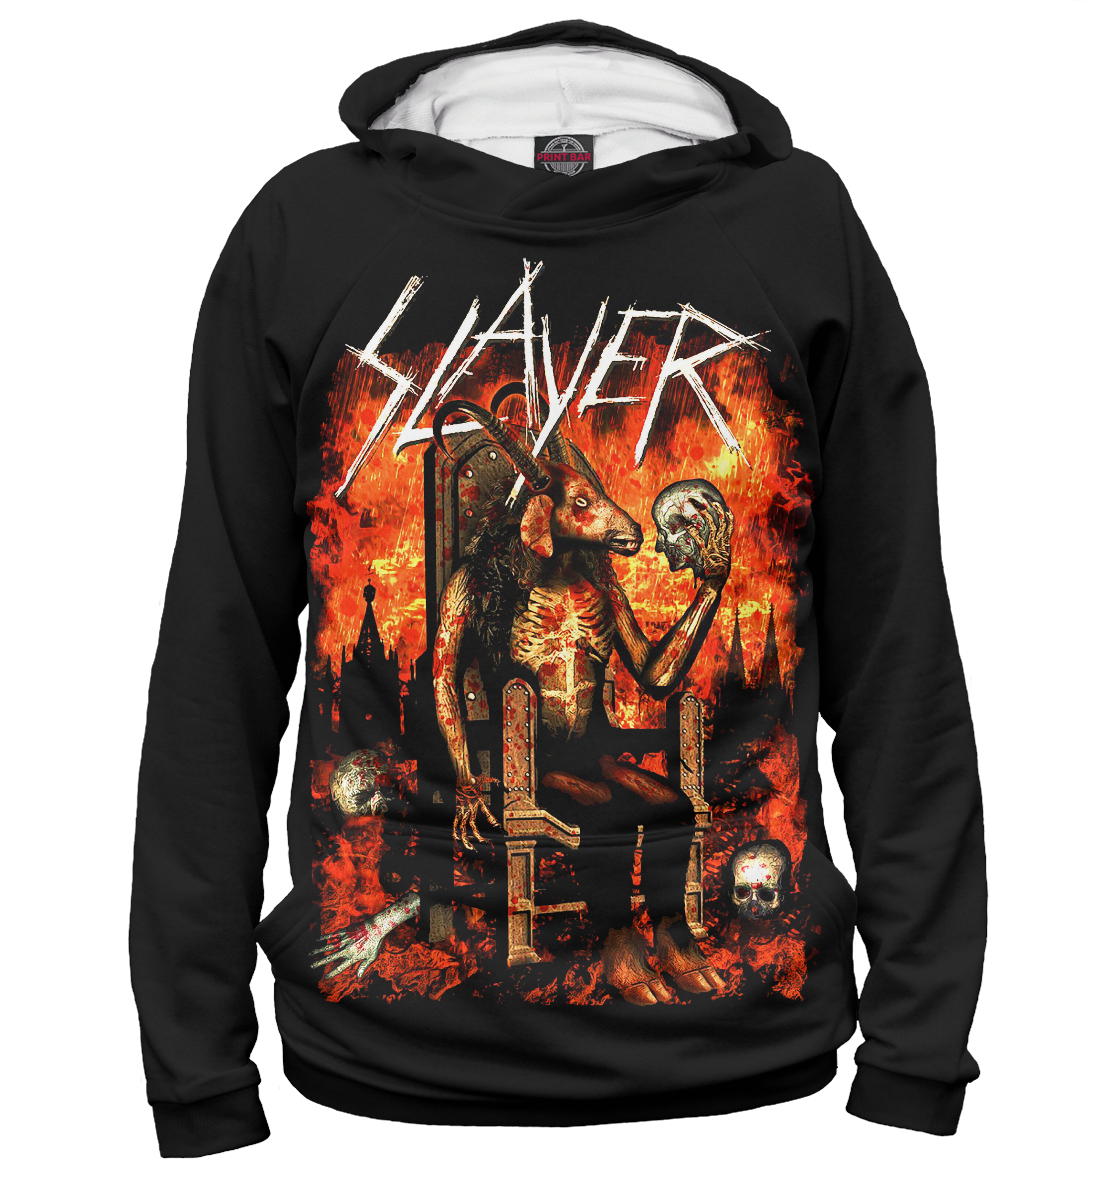 Slayer, Printbar, Худи, SLR-429357-hud-1  - купить со скидкой